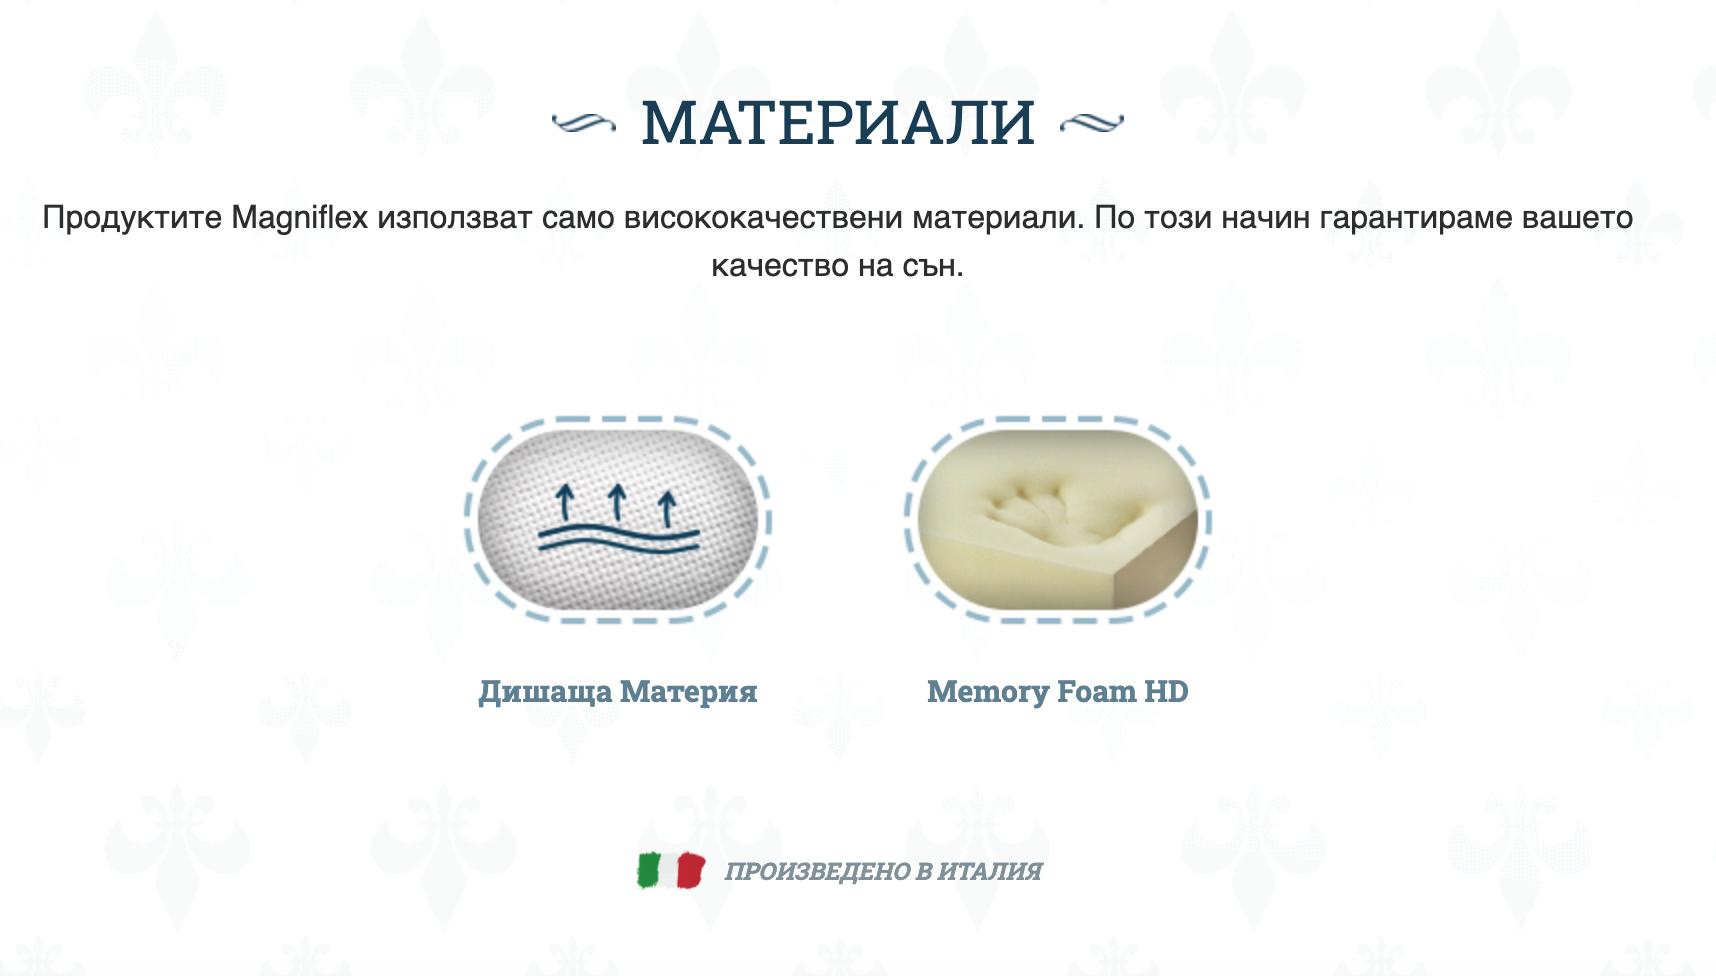 (Български) Матрак Magniflex Arte